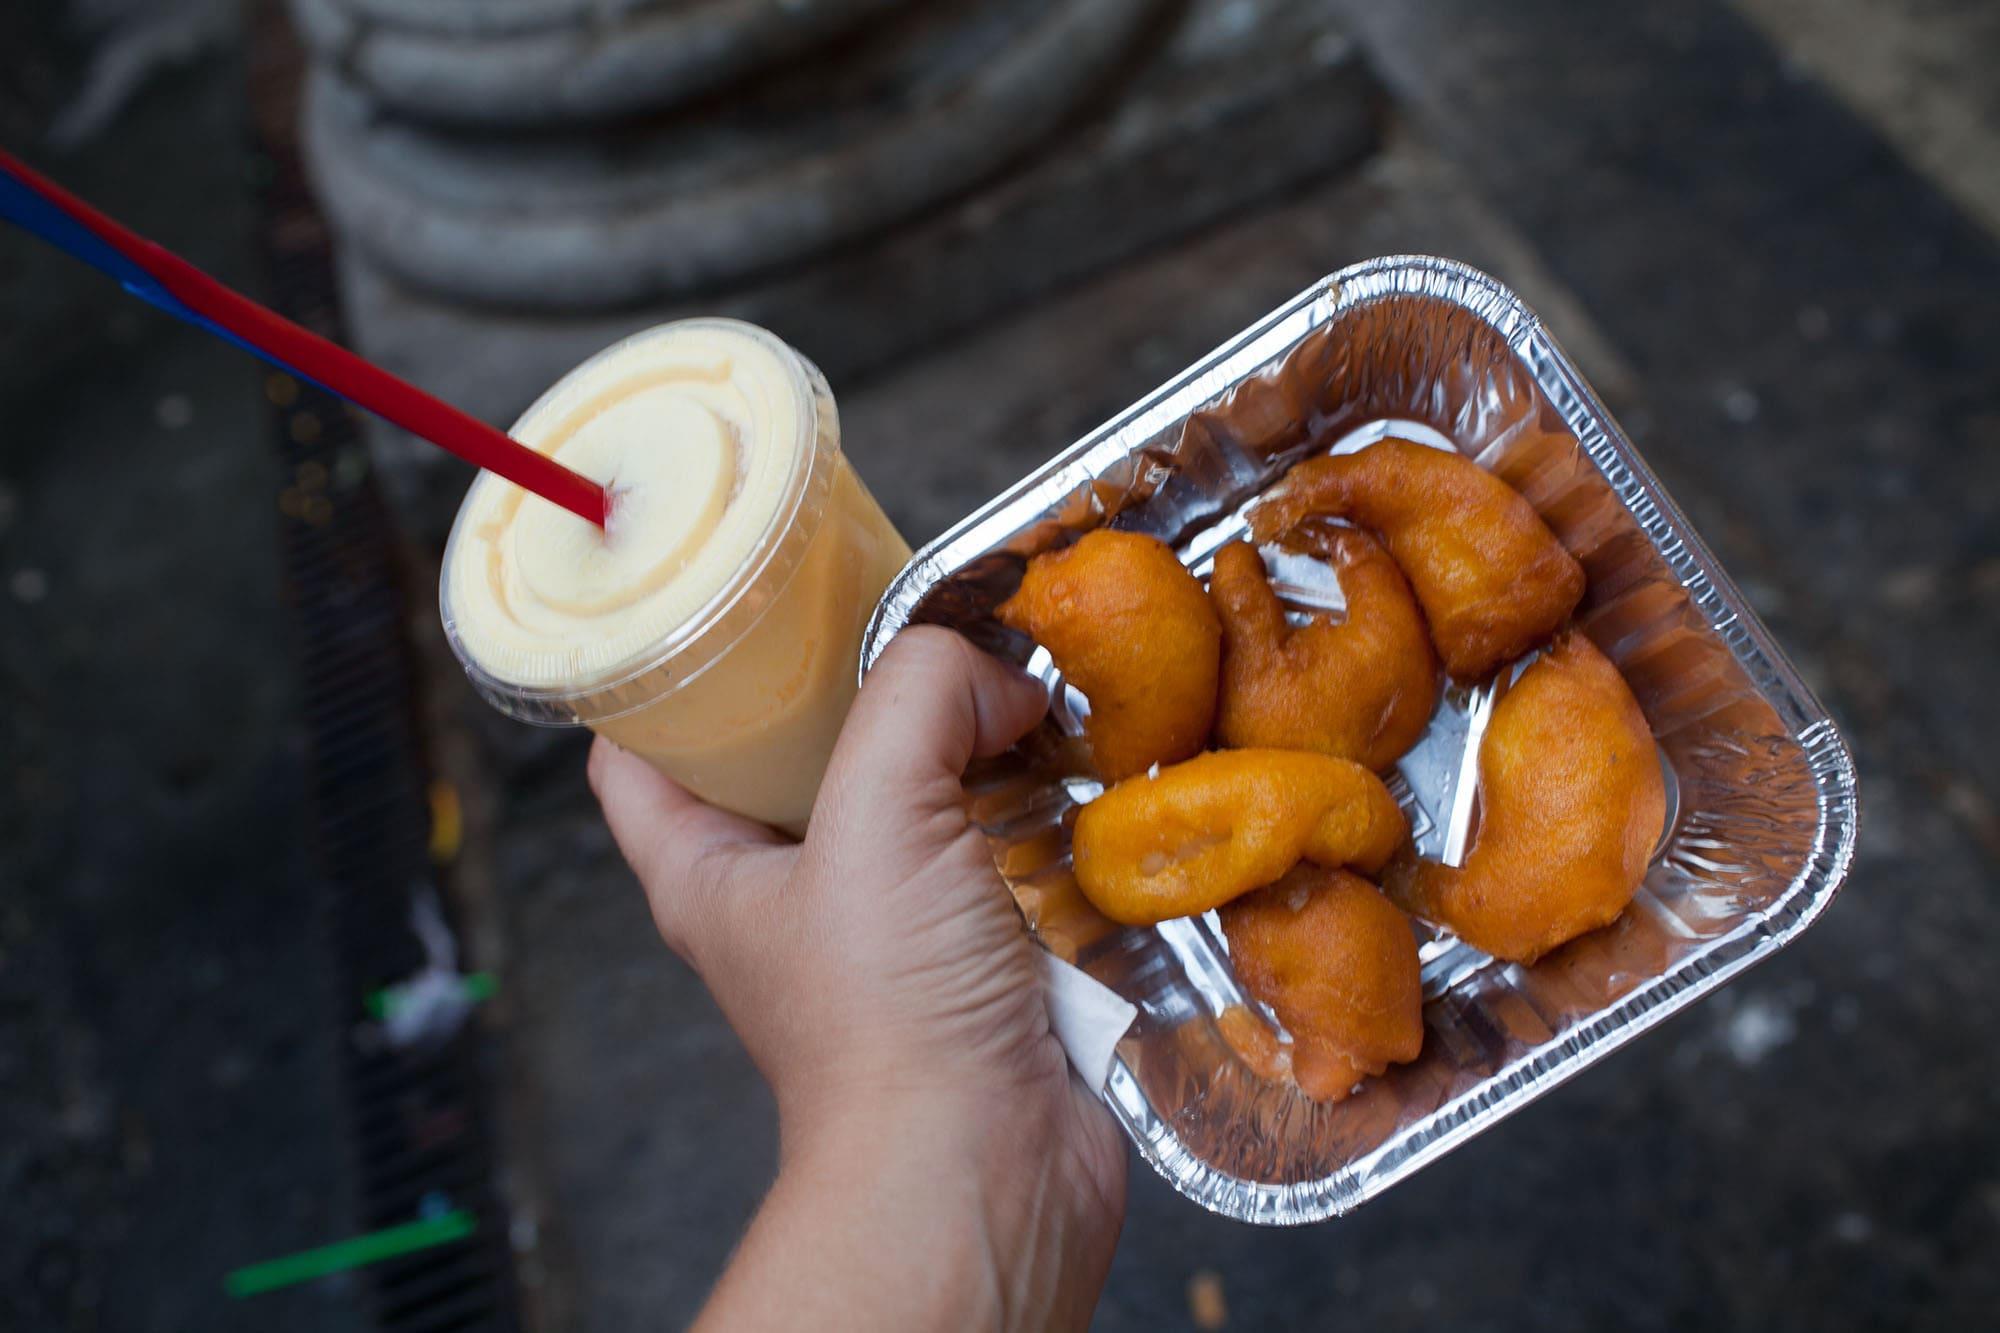 Fried shrimp from Mercat de Sant Josep de La Boqueria in Barcelona, Spain.